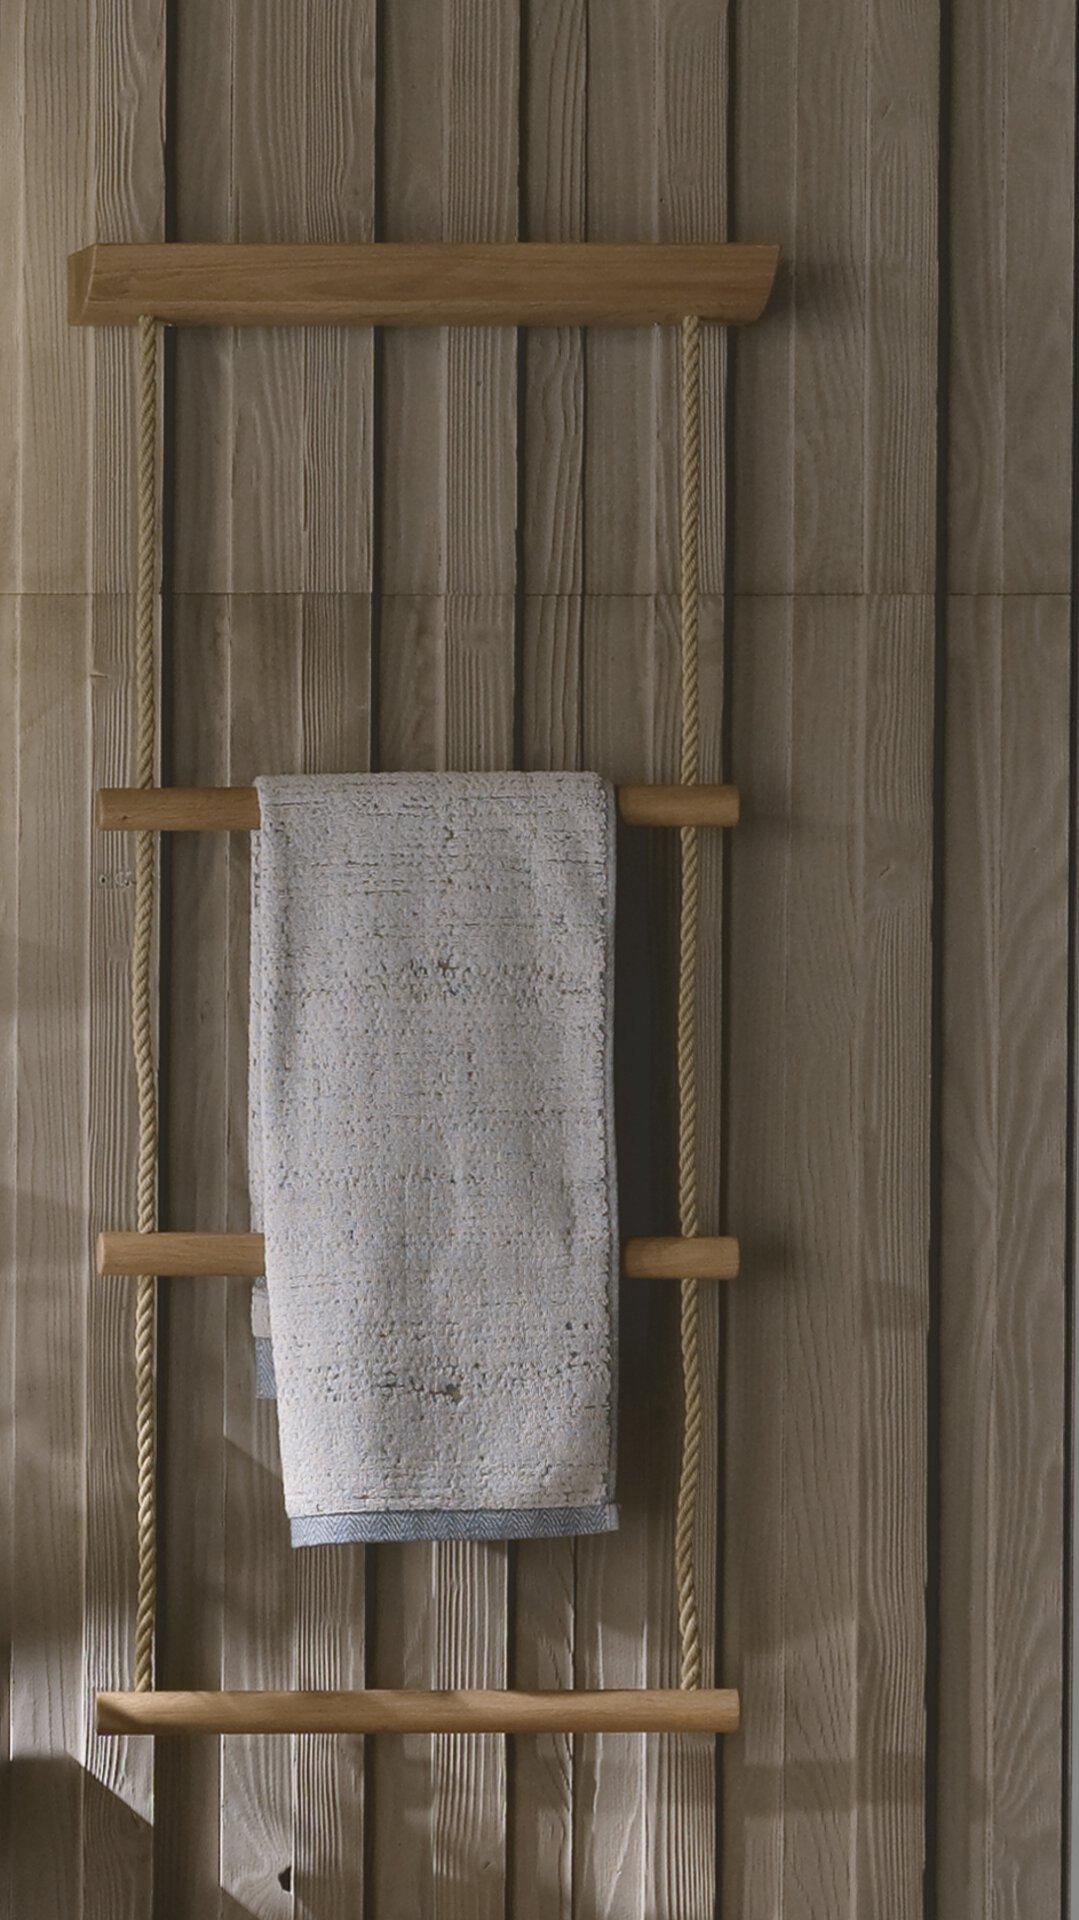 Handtuchhalter V-Quell Voglauer Textil